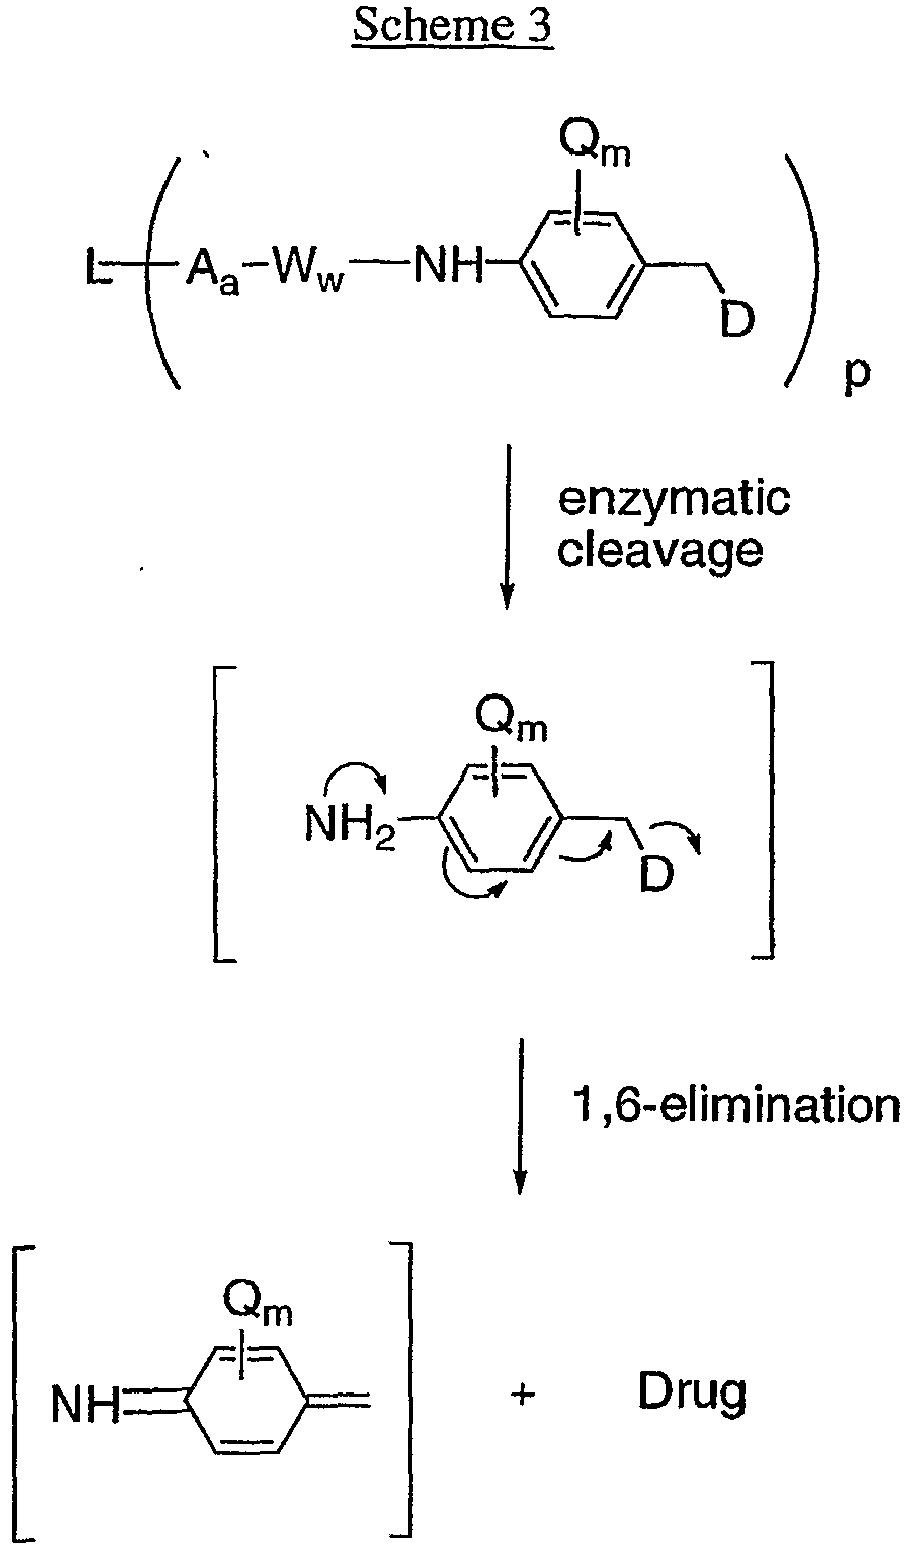 organic reaction mechanisms 1986 knipe a c watts w e